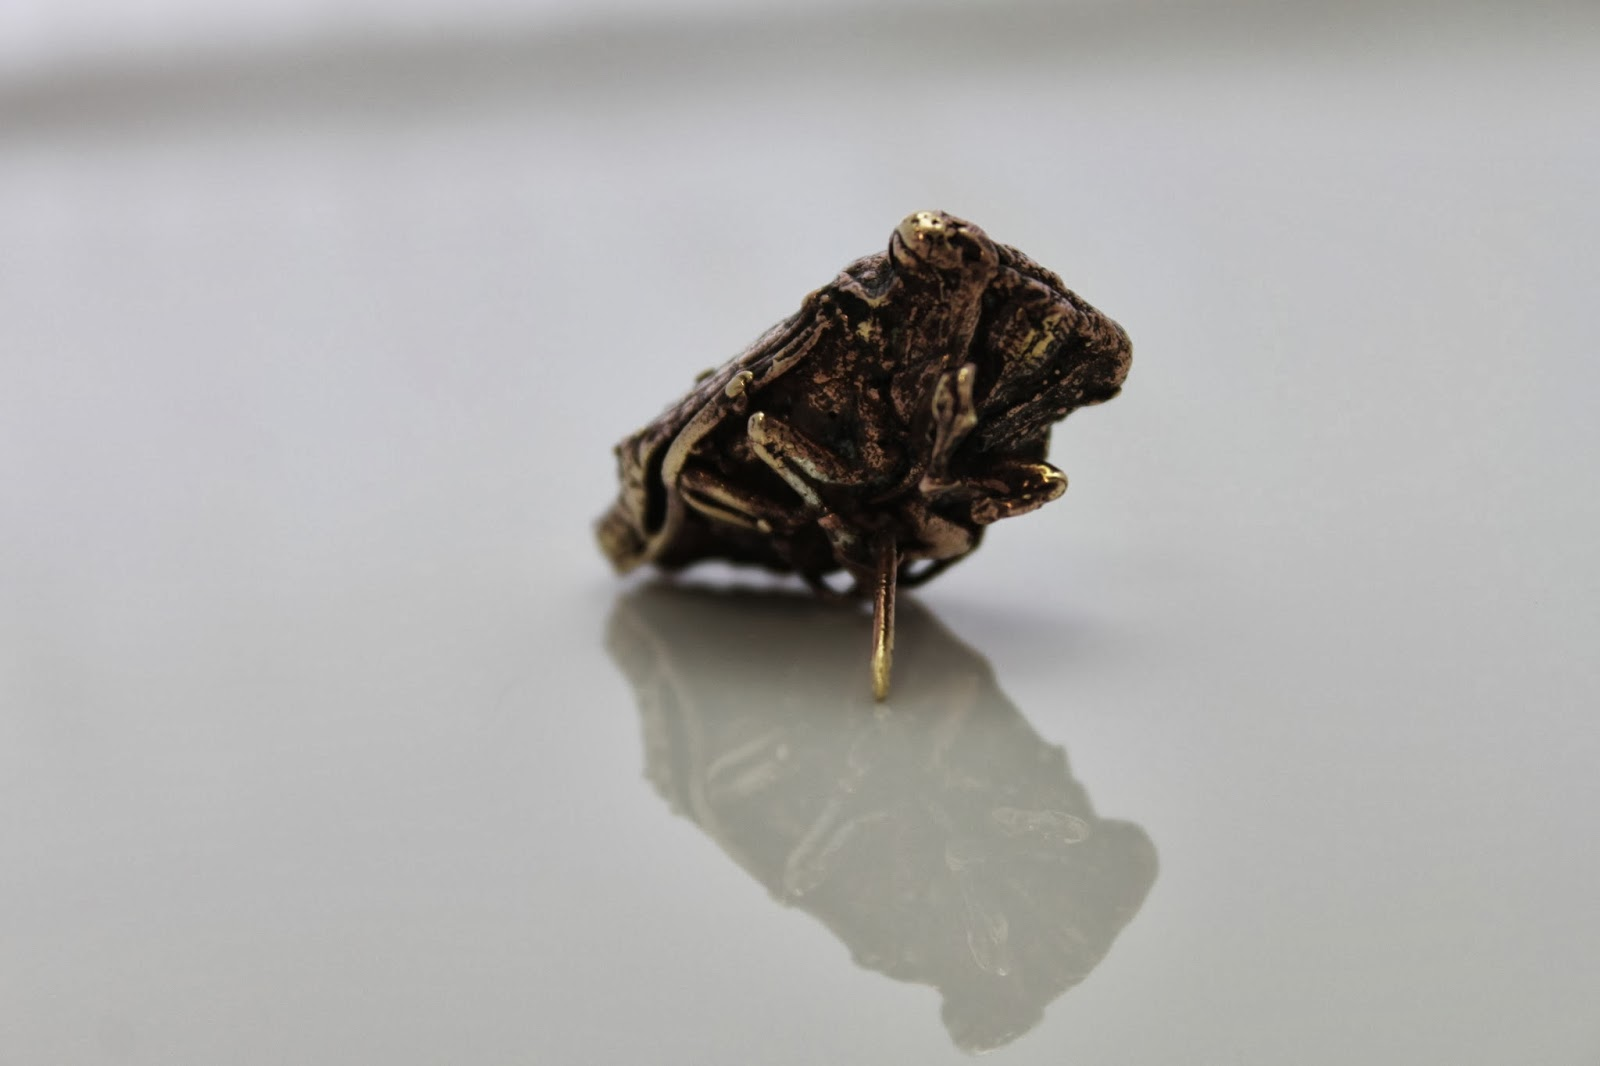 cicada cast nugold pin brooch art rustic rough